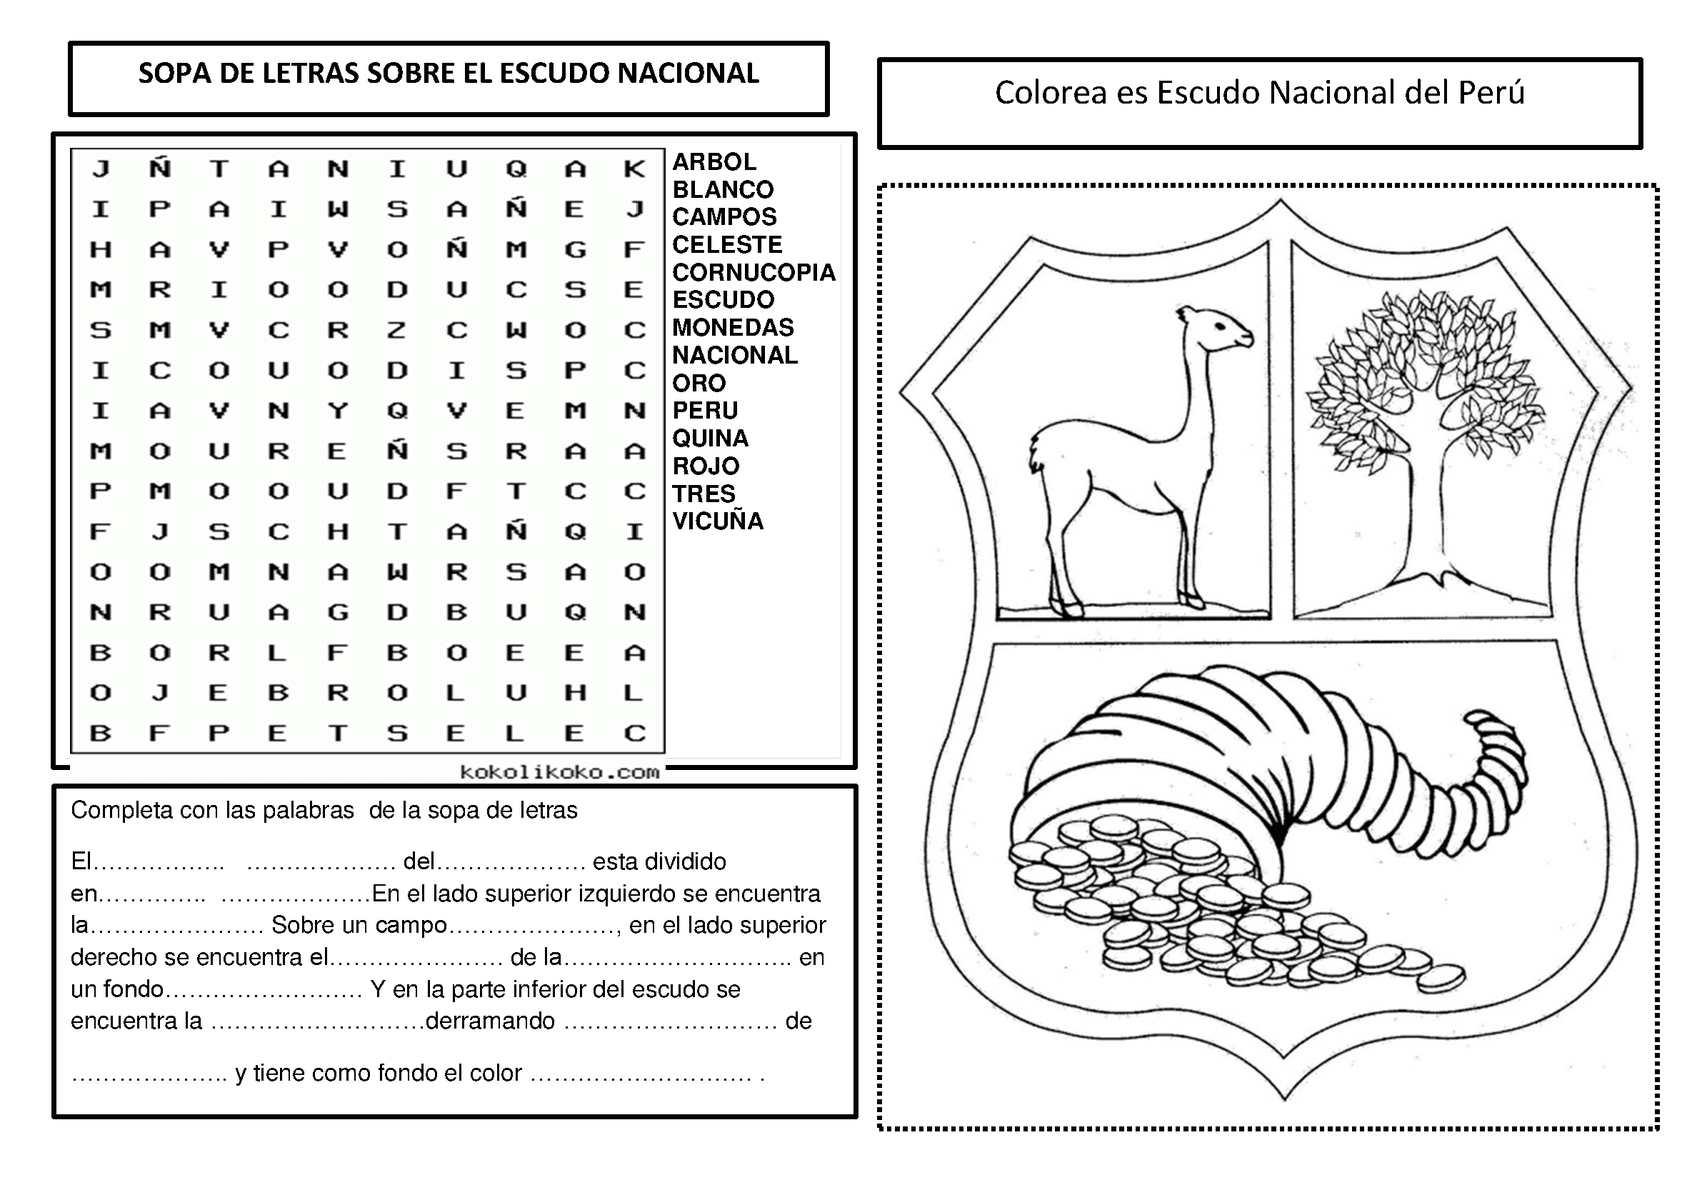 Calaméo - FICHA DE APLICACION DEL ESCUDO NACIONAL DEL PERU PARA ...